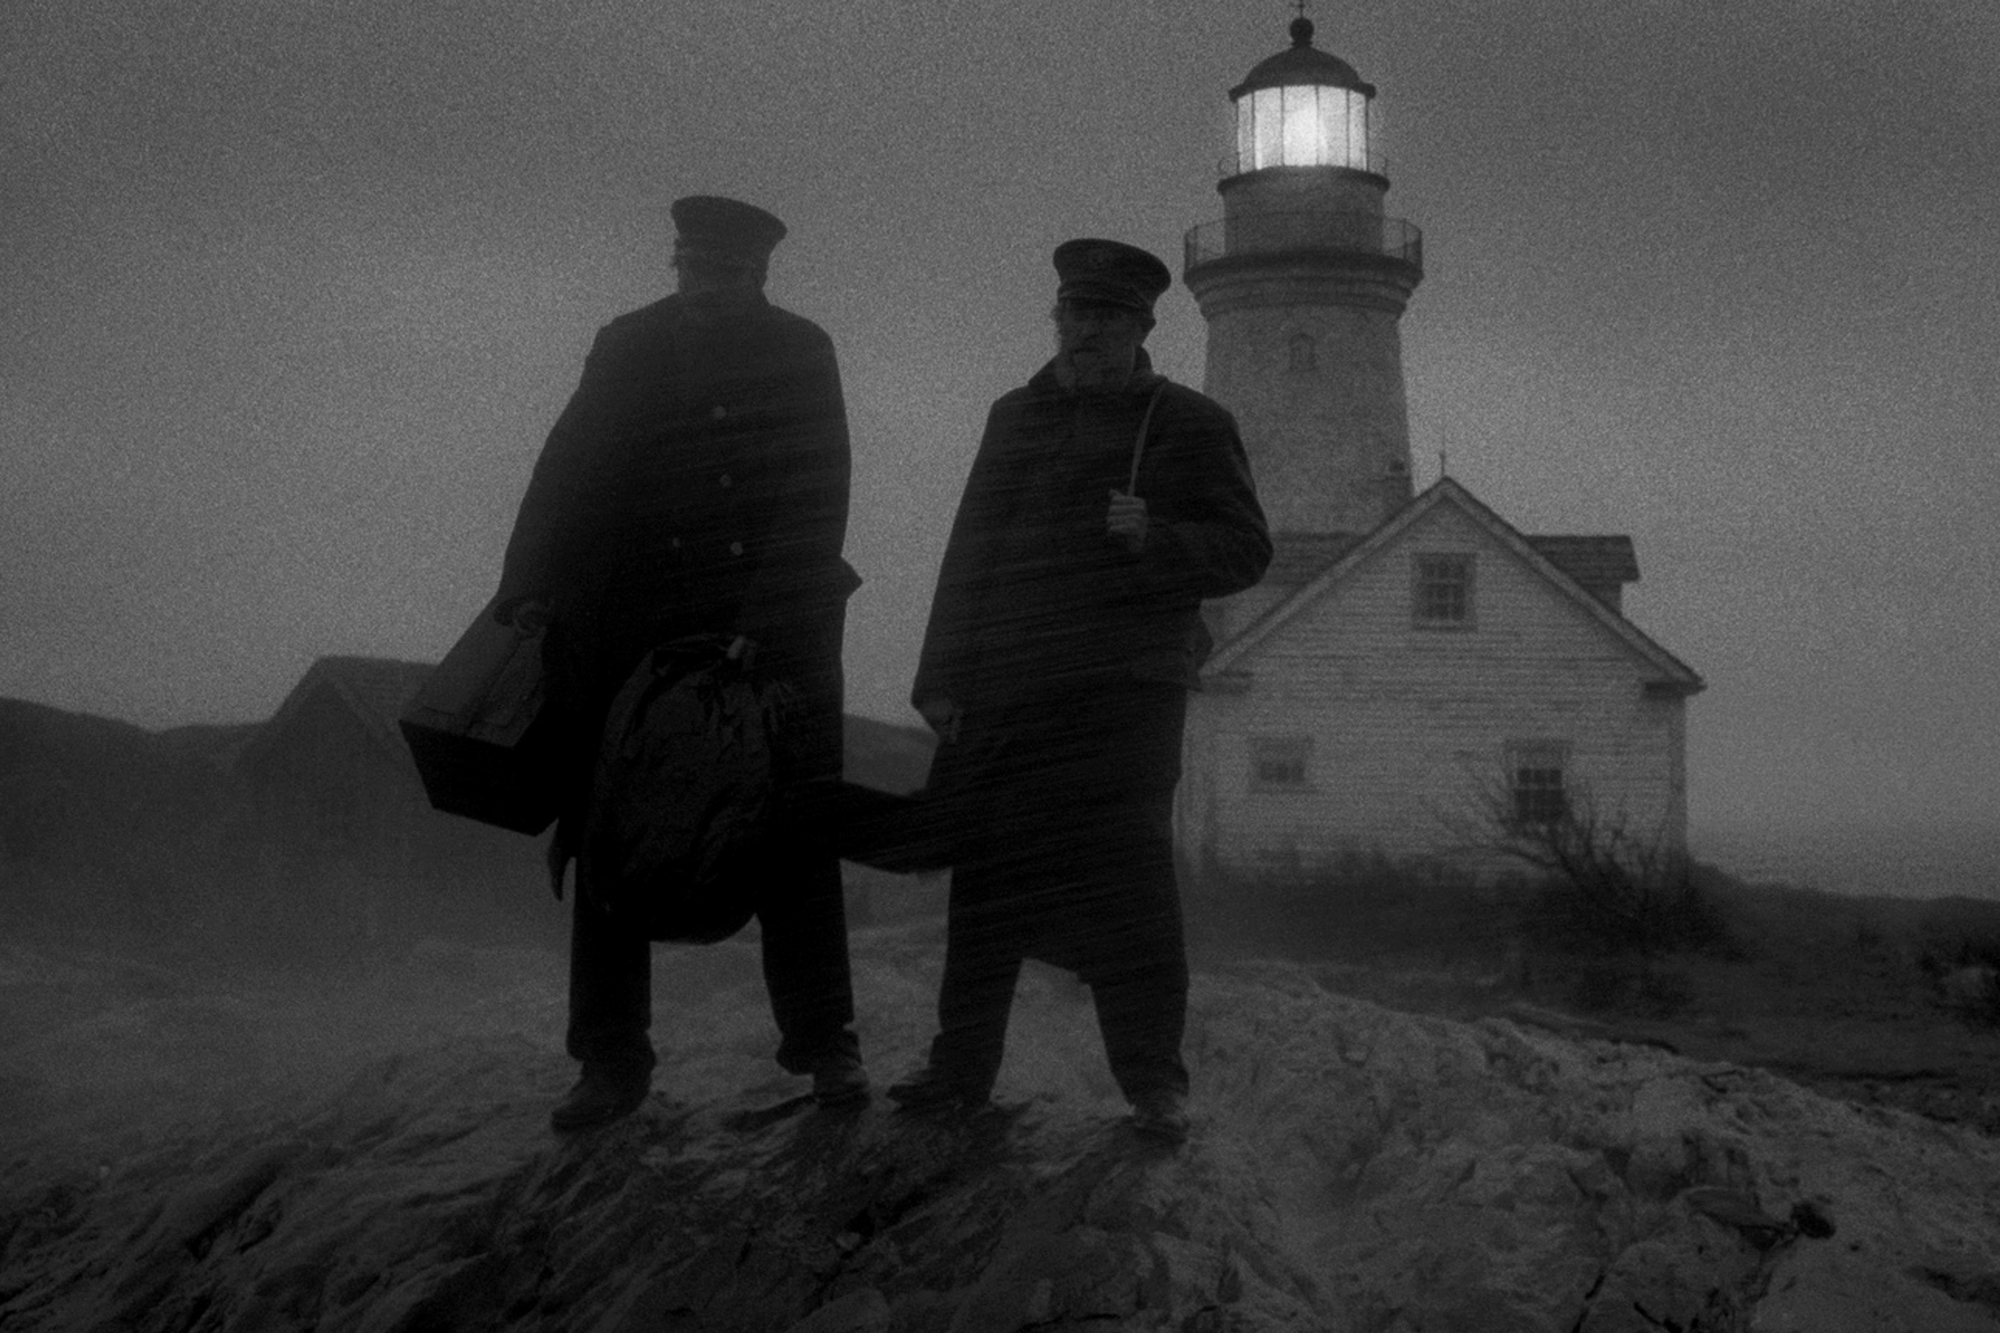 Drunken Sailors and Movie Stars: Robert Eggers on Making 'The Lighthouse'